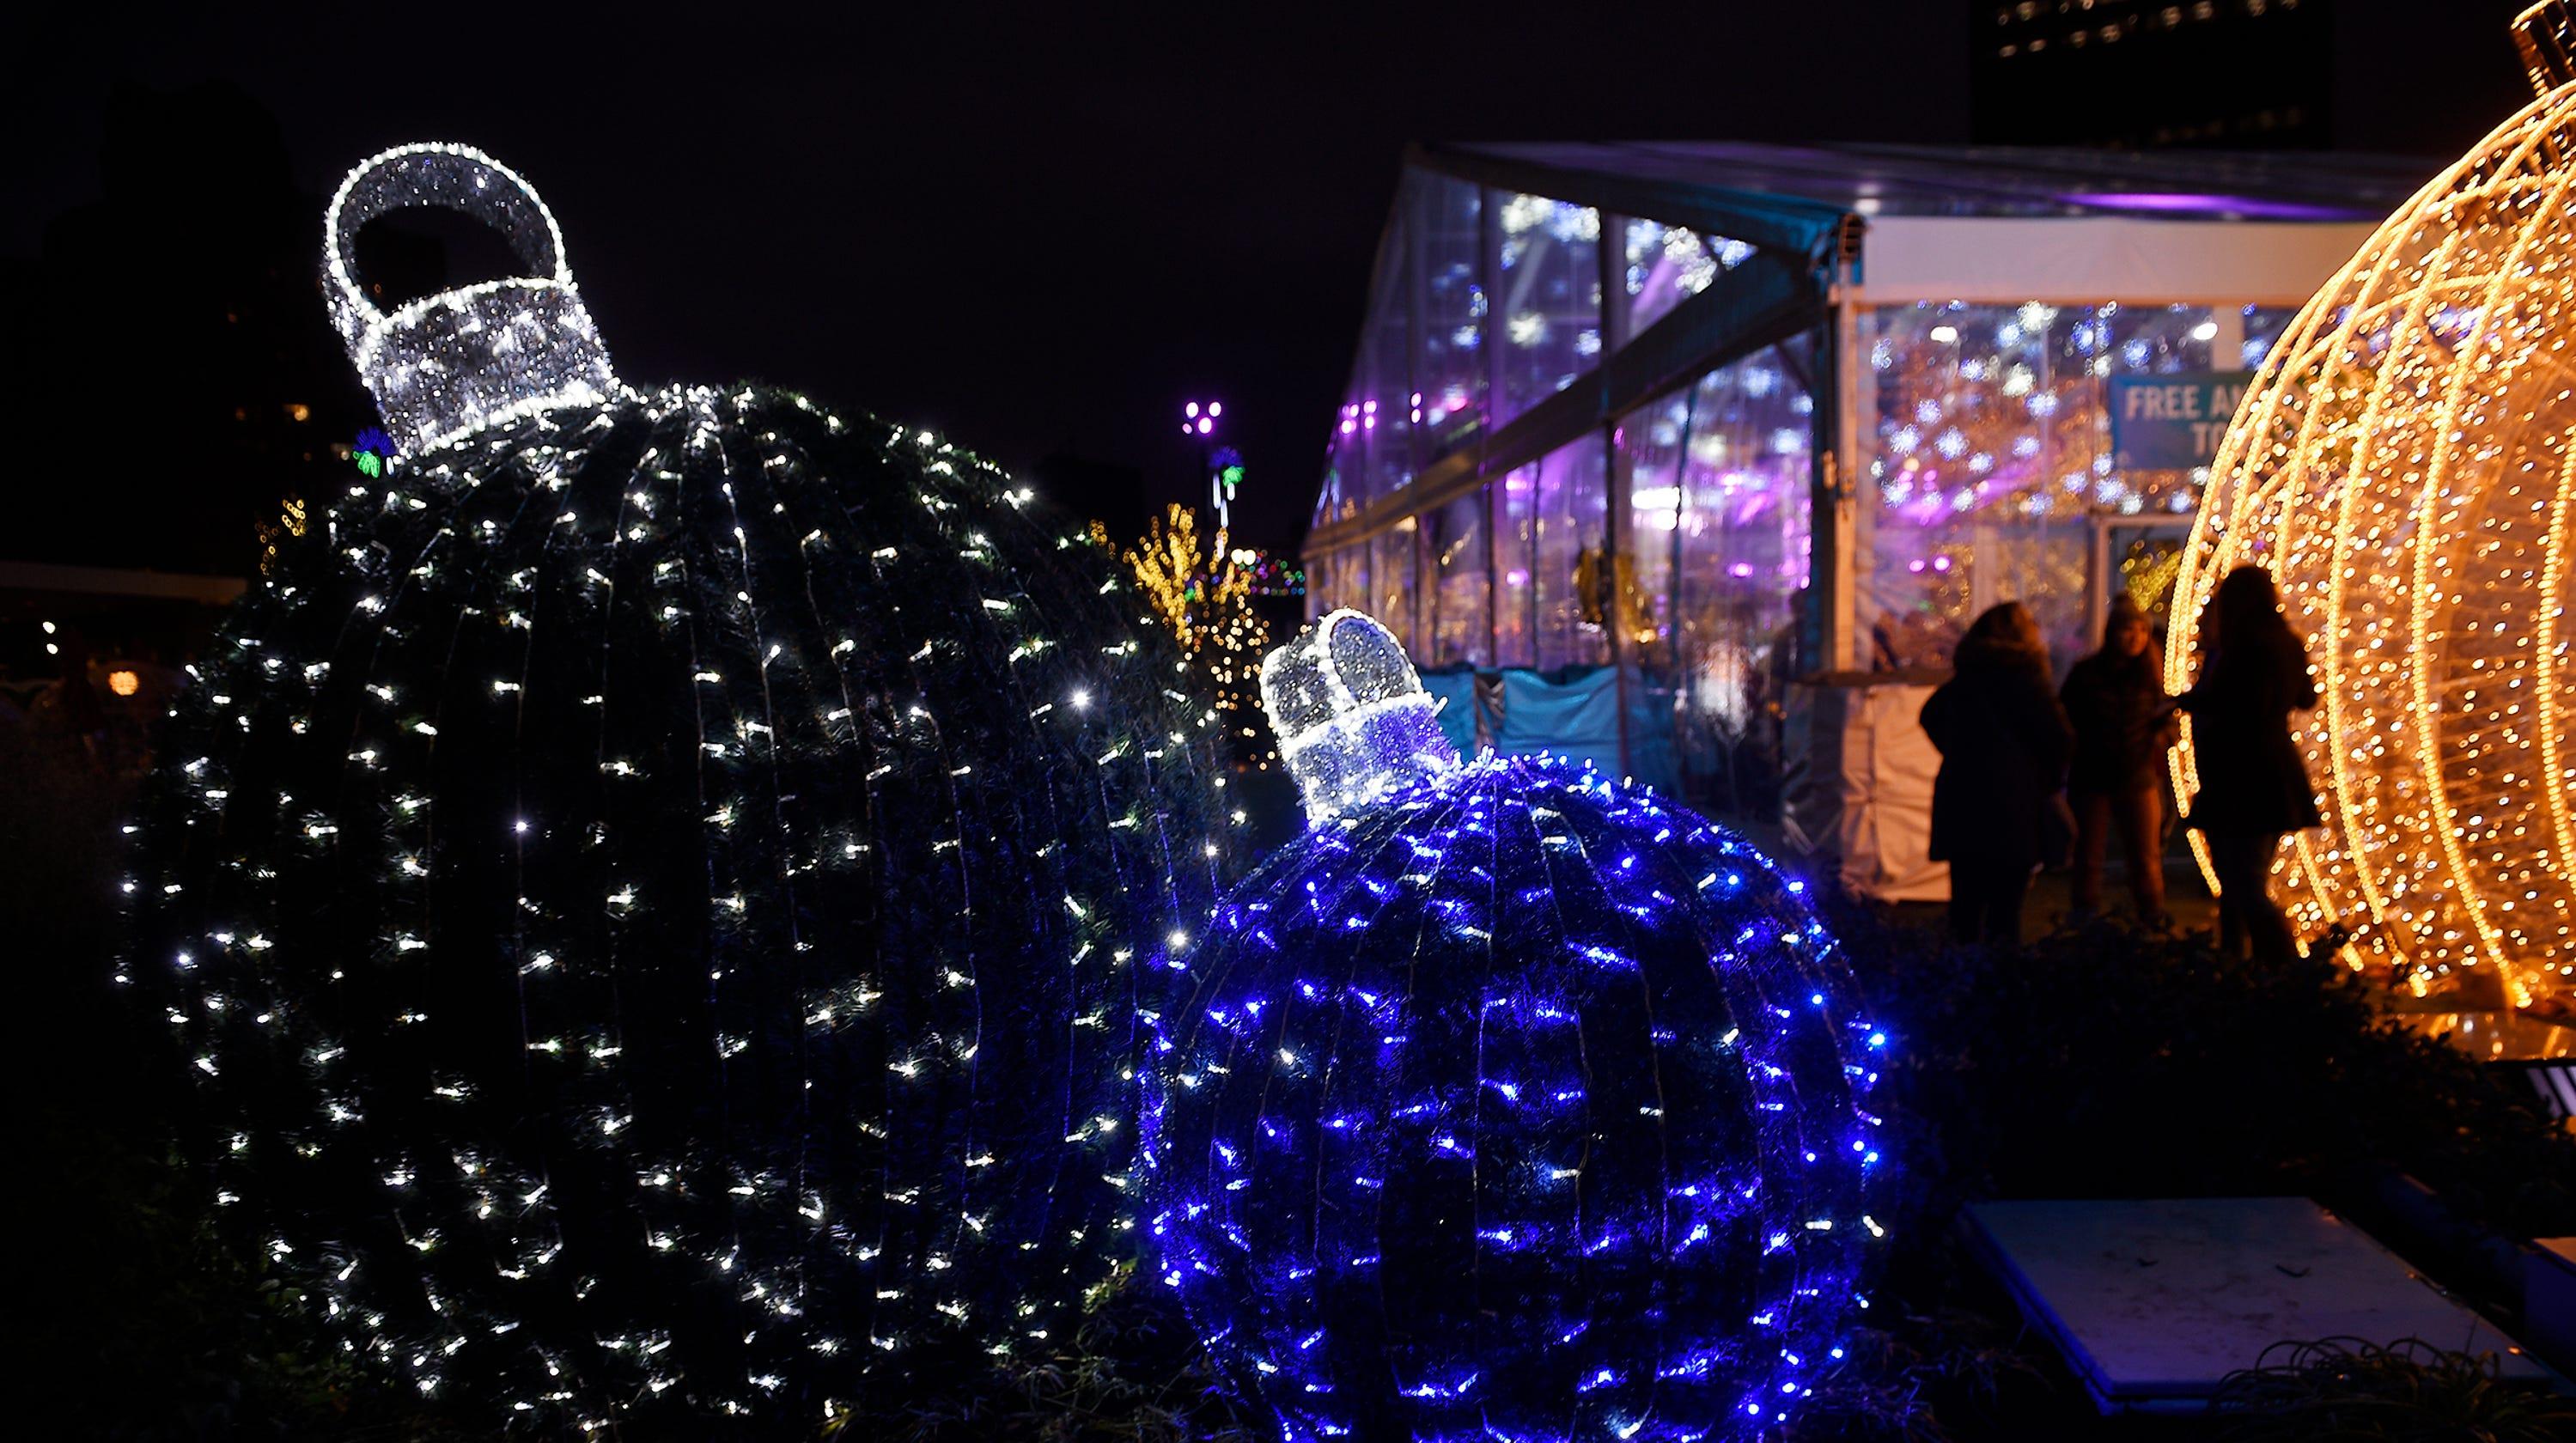 White Christmas Forecast.Forecast White Christmas Unlikely This Year